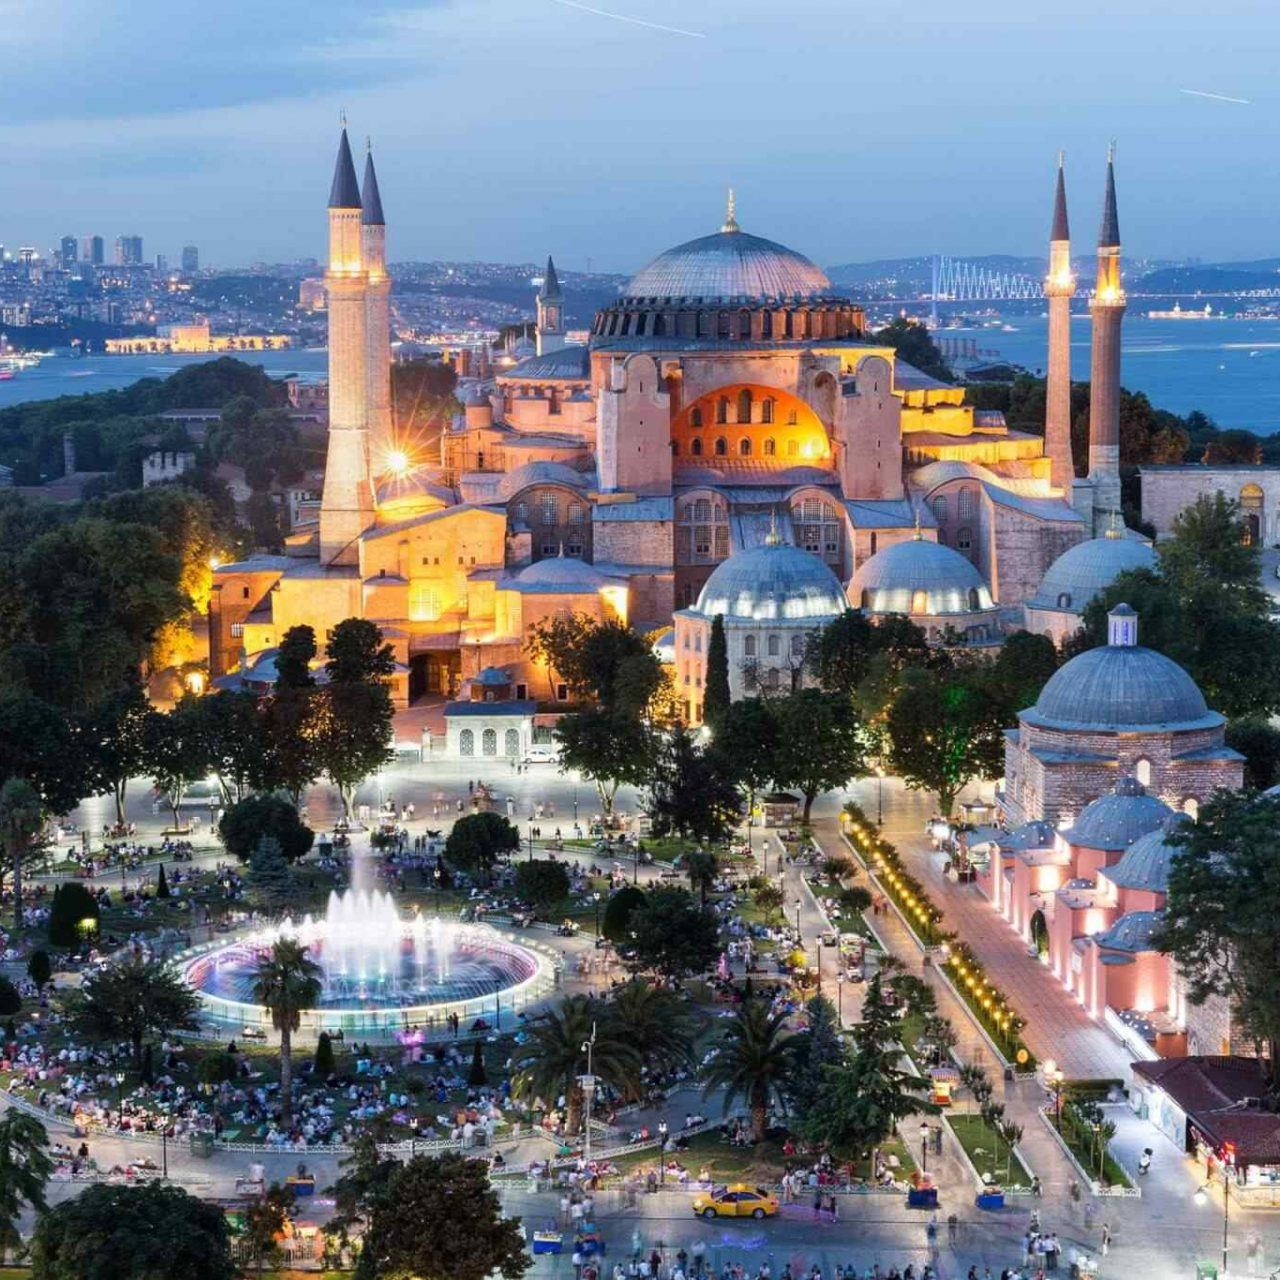 https://proline.co/wp-content/uploads/2018/09/destination-istanbul-02-1280x1280.jpg